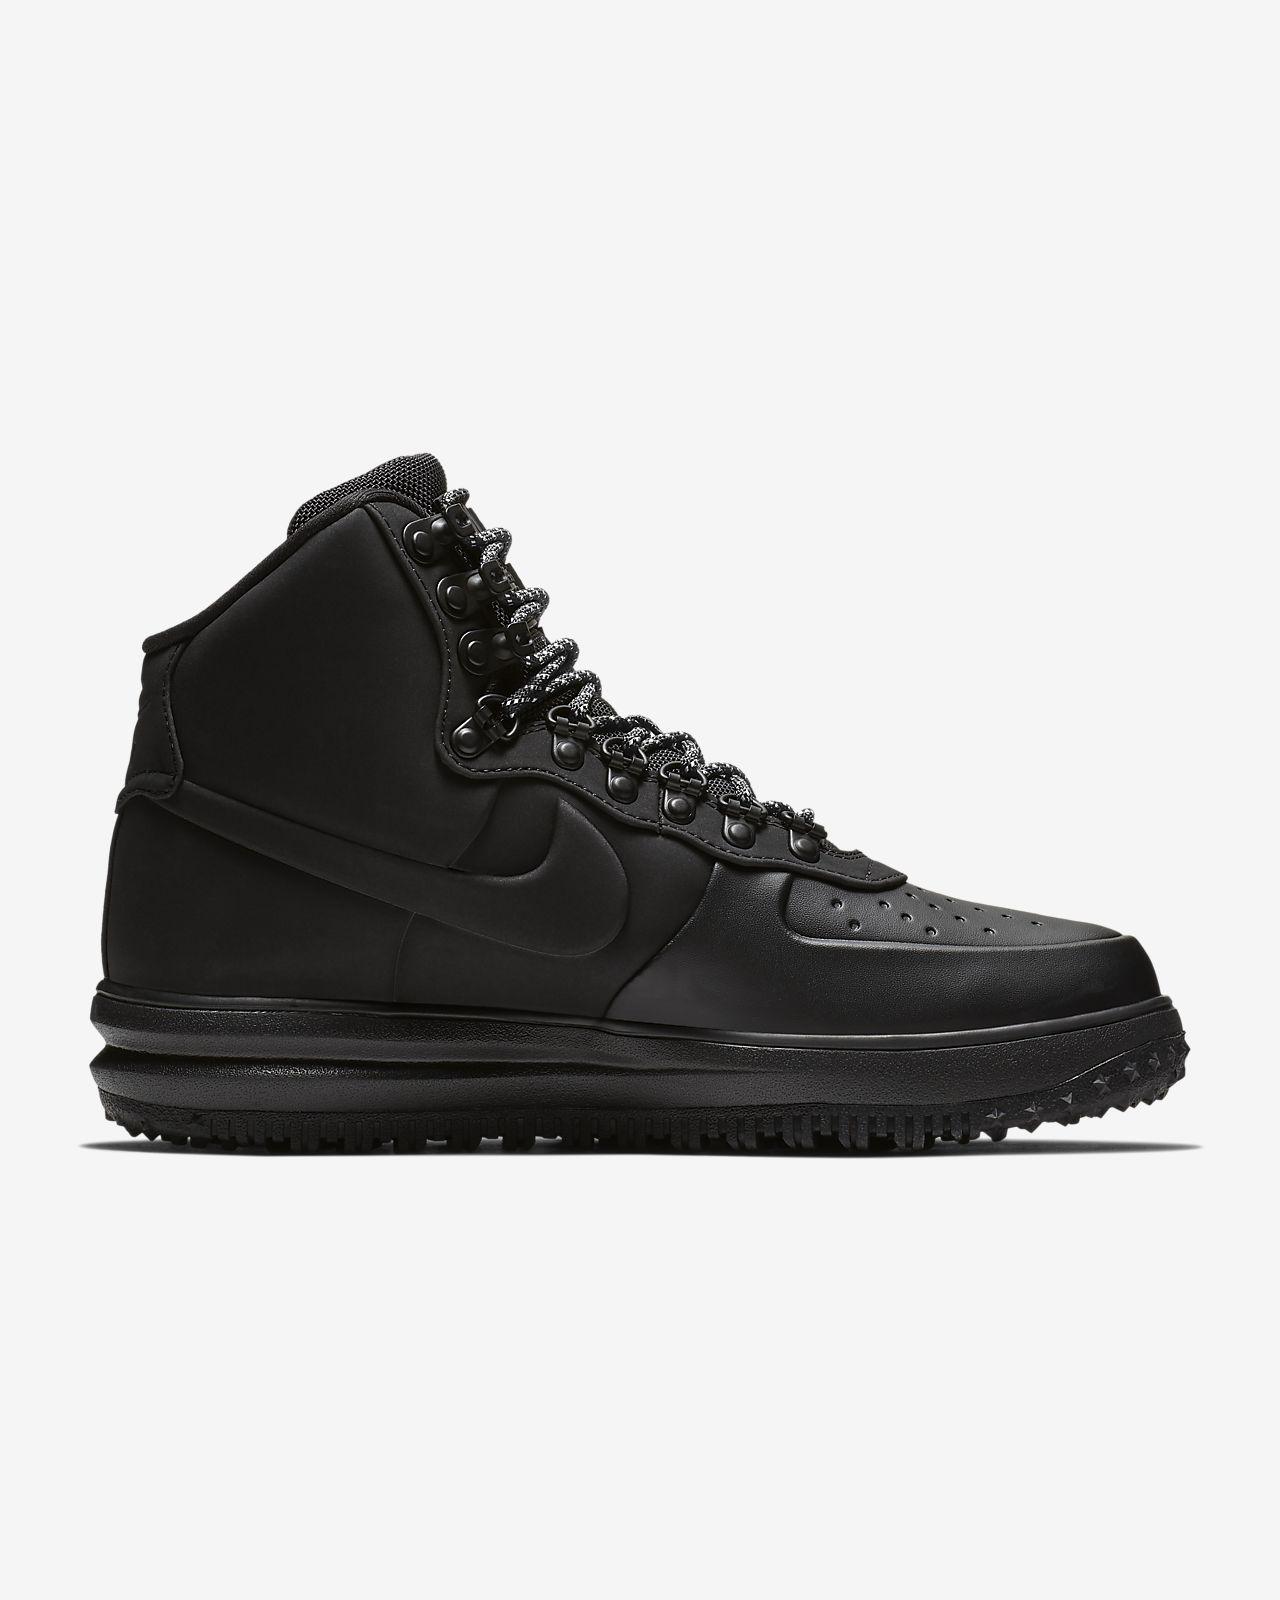 Nike Lunar LF1 Air Force 1 Duckboot '18 Triple All Black Boots BQ7930 003 Size